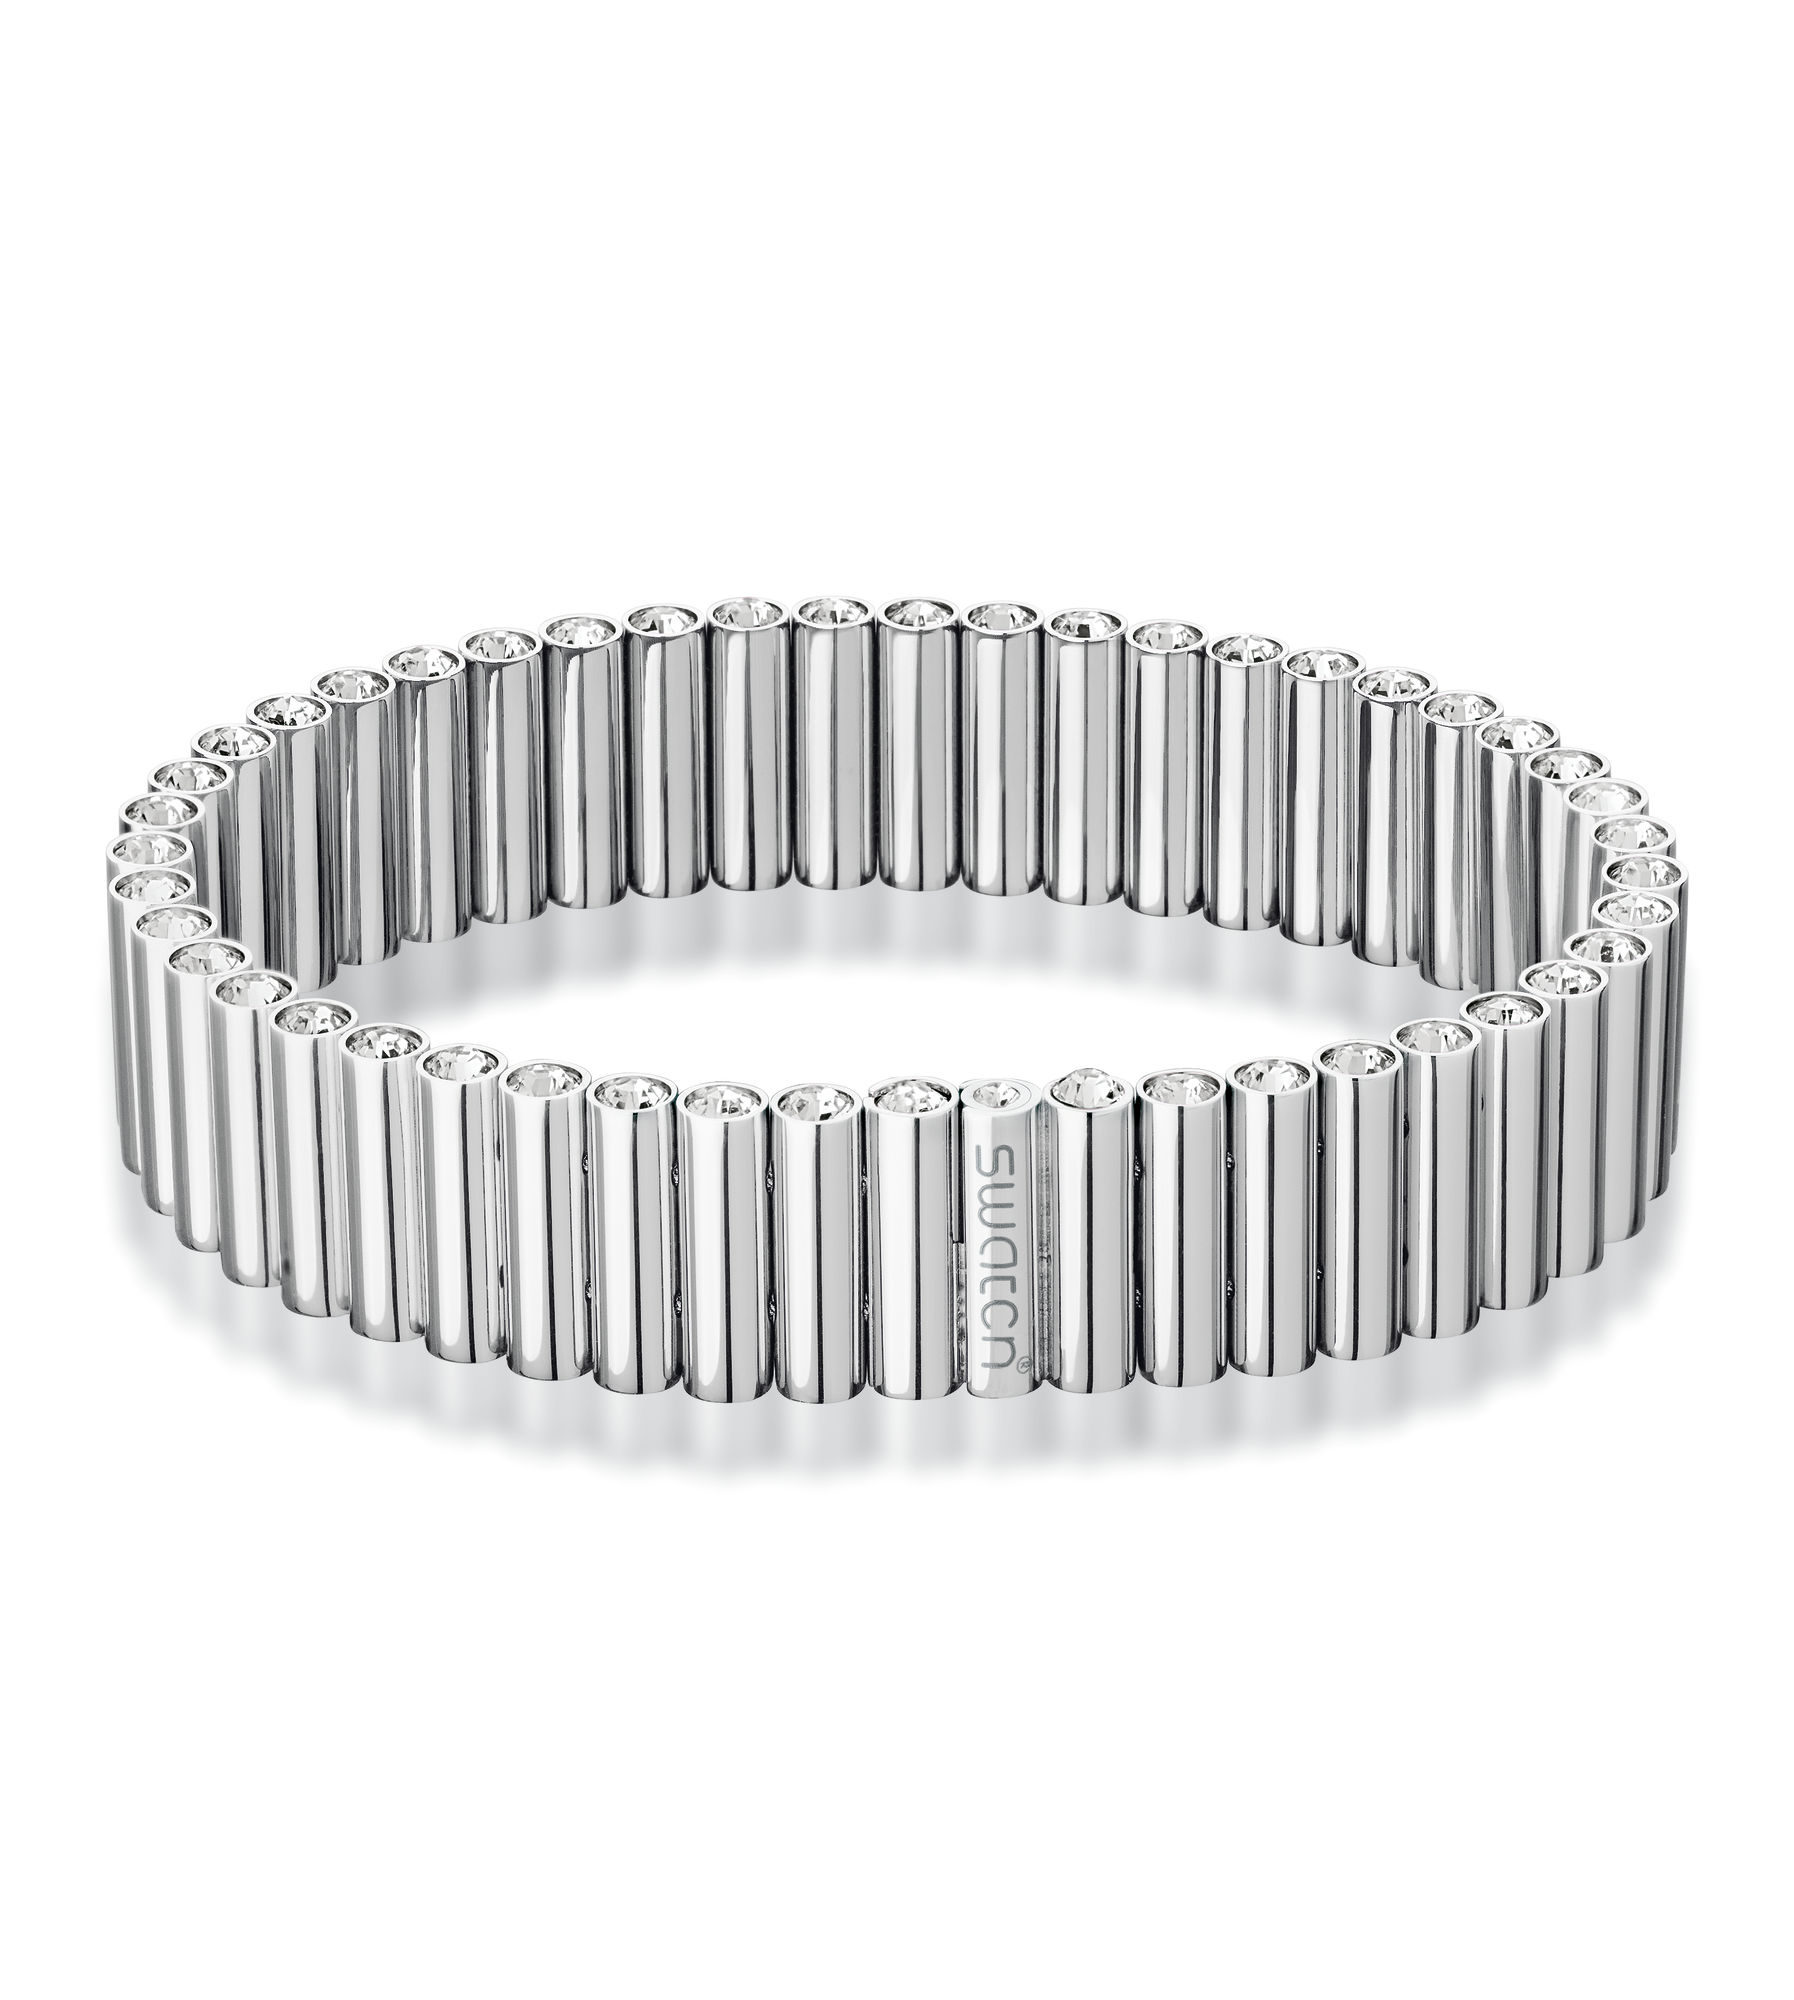 swatch bracelet